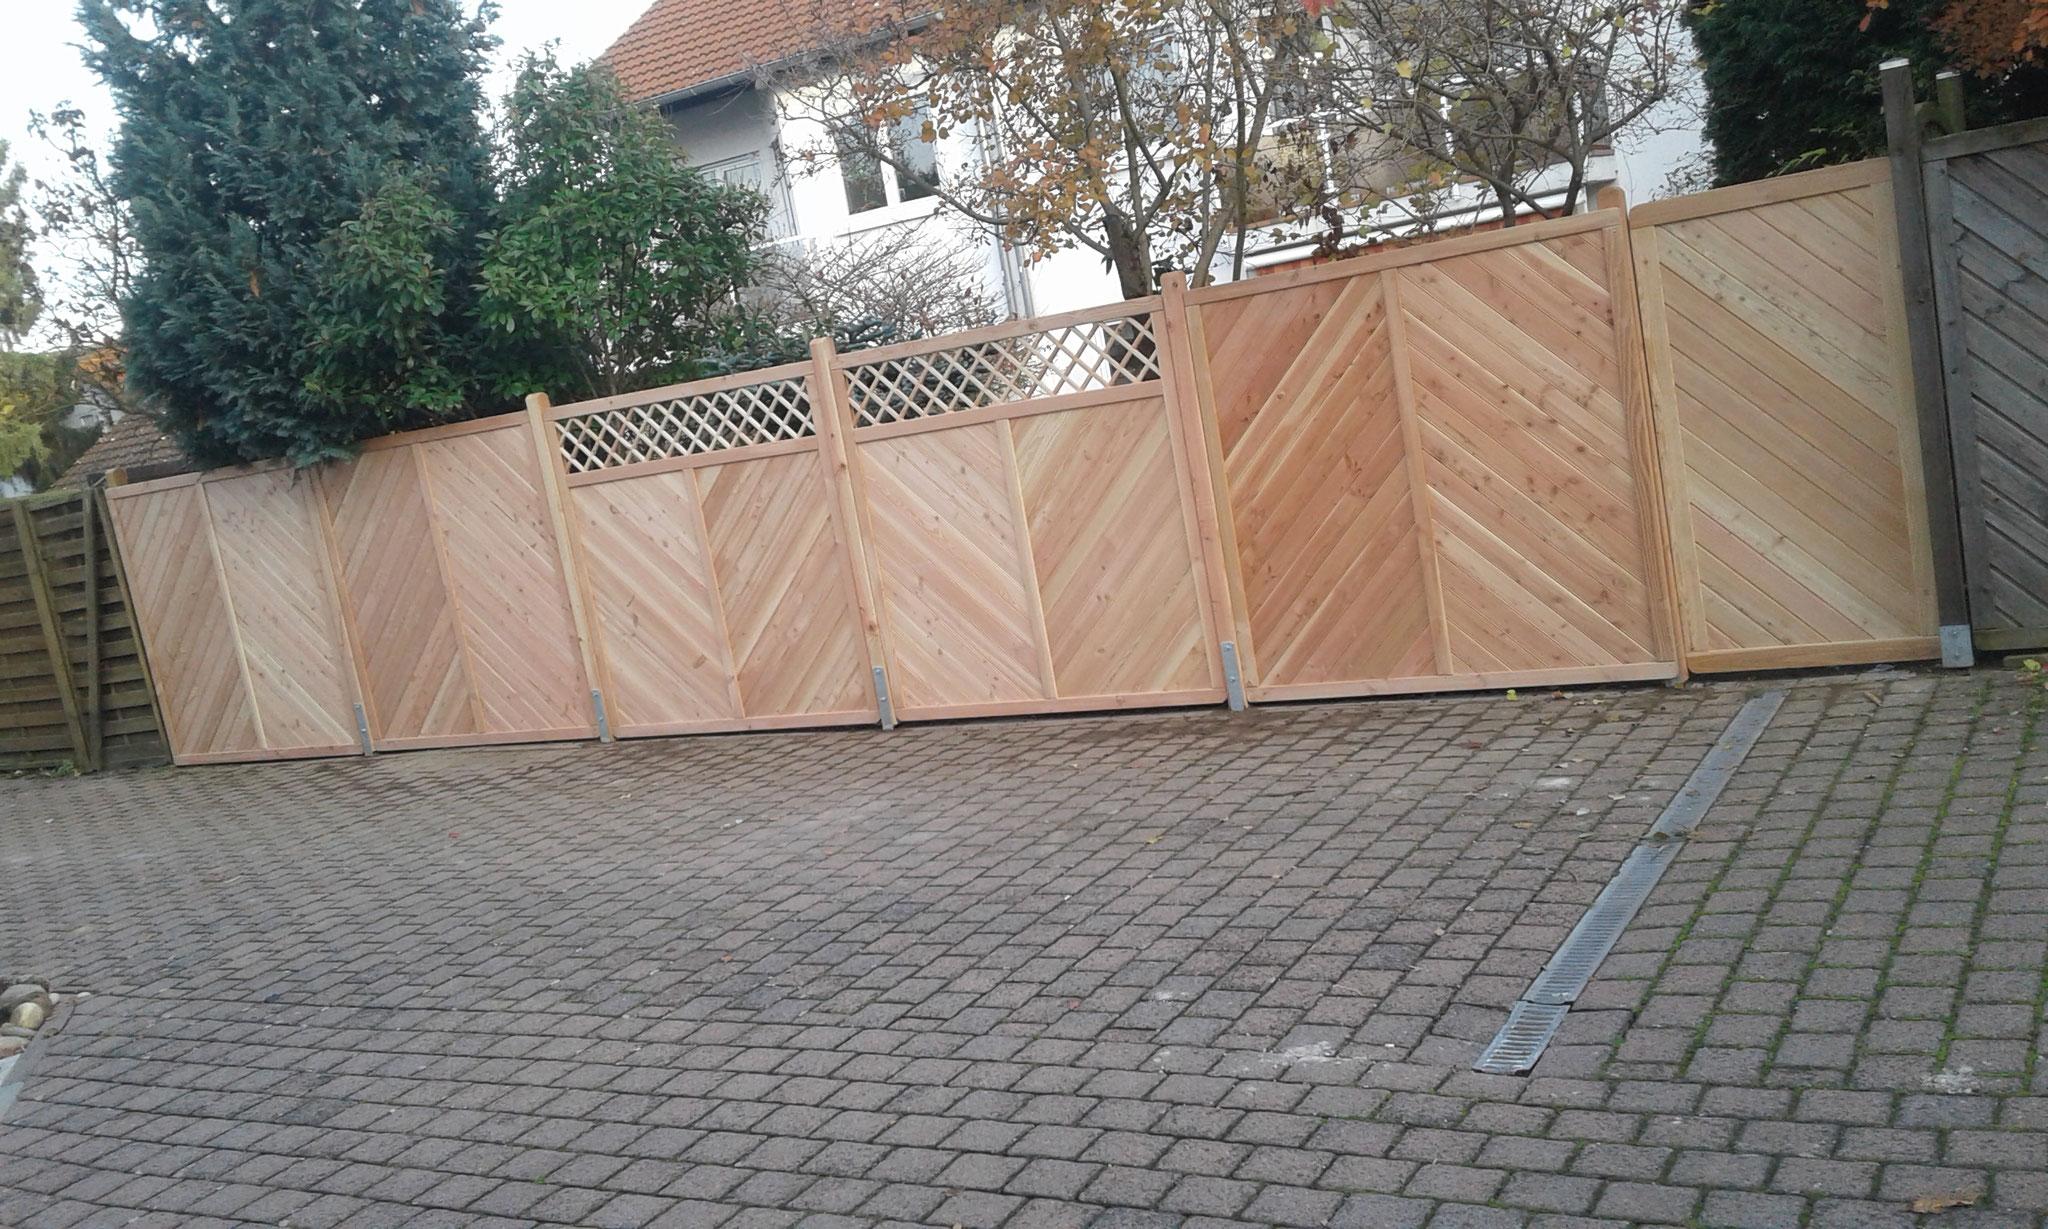 Zaunbauprojekt Mainz 2017 - NACHHER